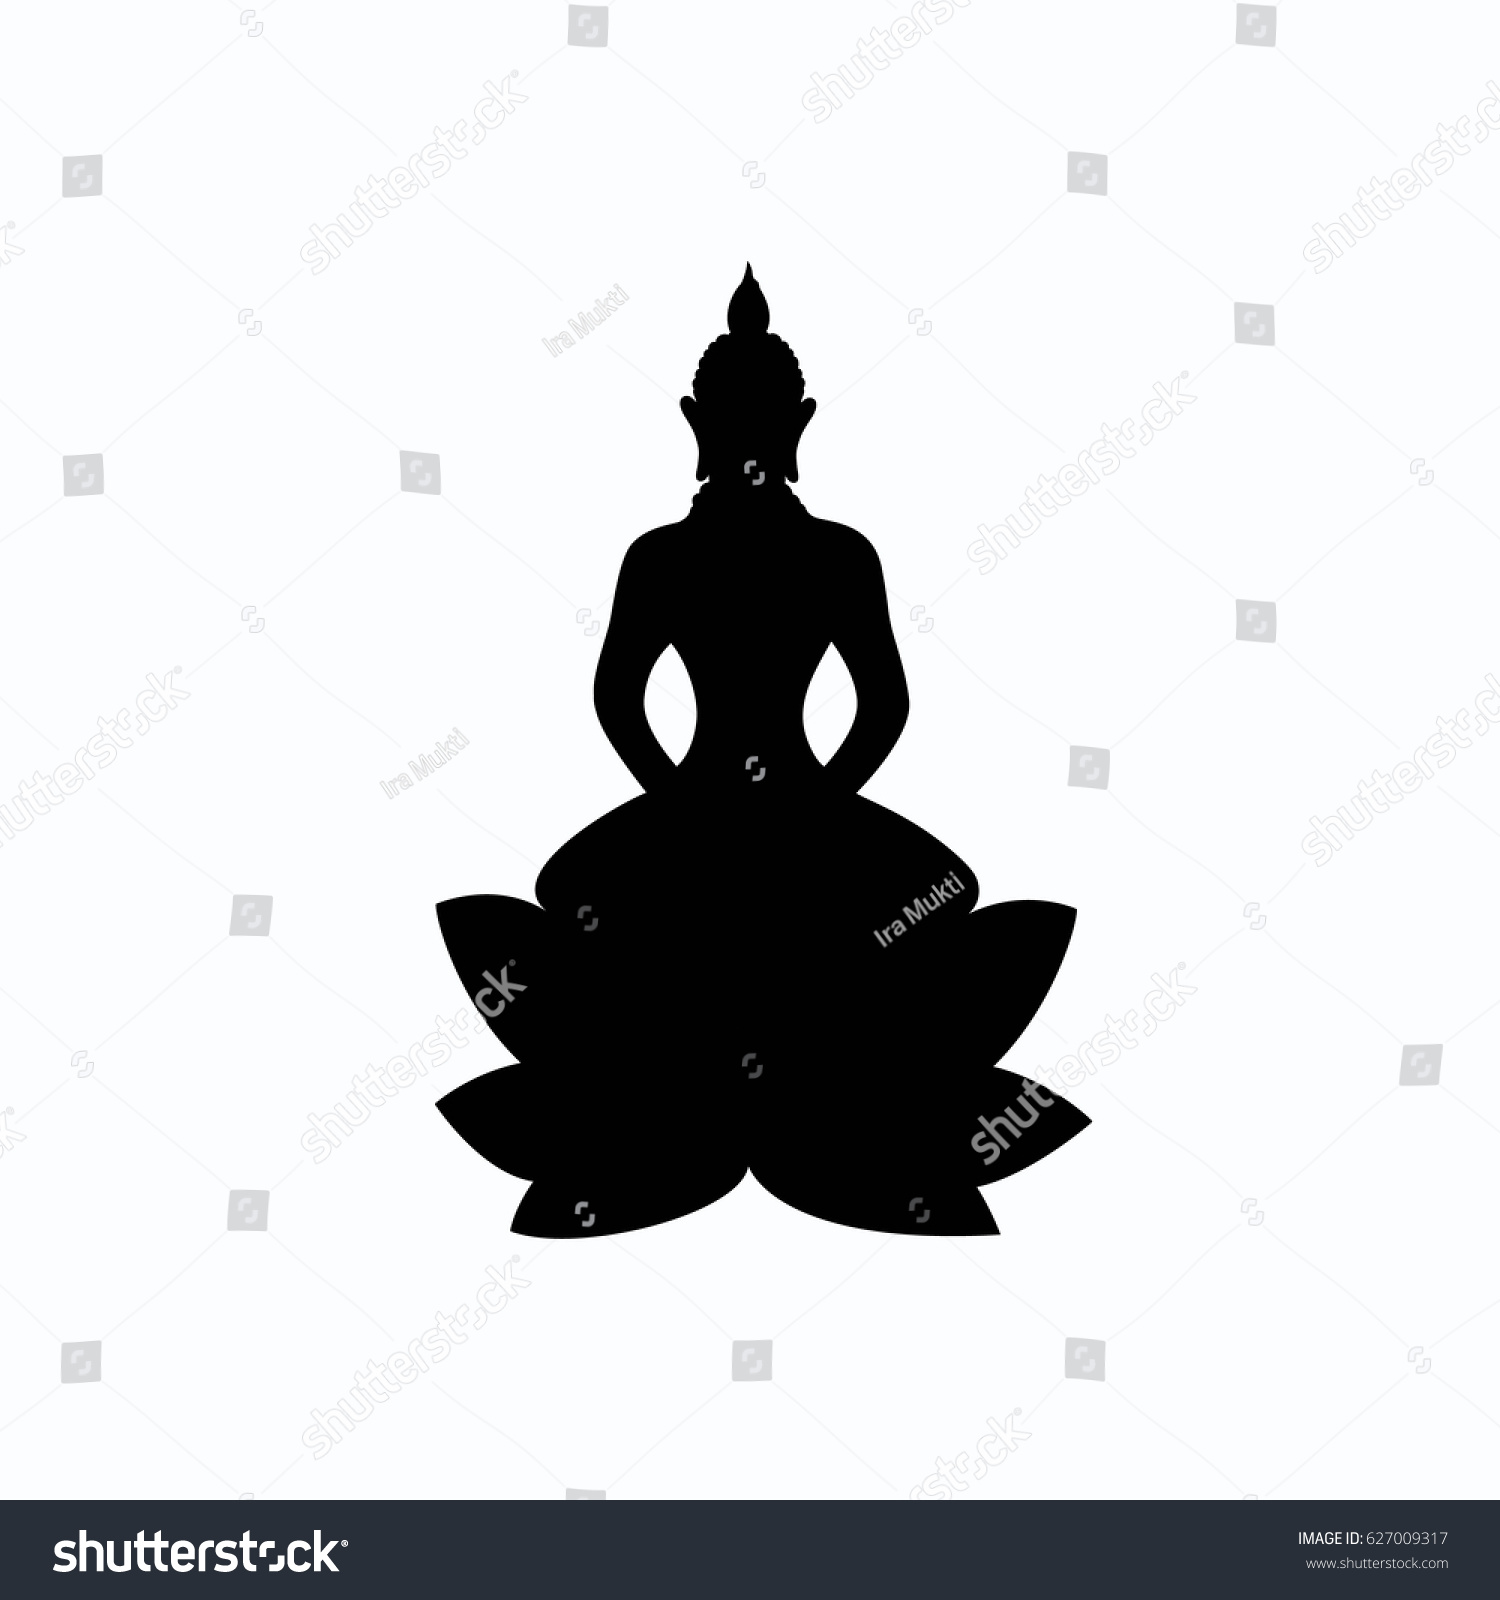 Buddha sitting on lotus flower black stock vector 627009317 buddha sitting on lotus flower black silhouette symbol yoga logo vector art buycottarizona Gallery